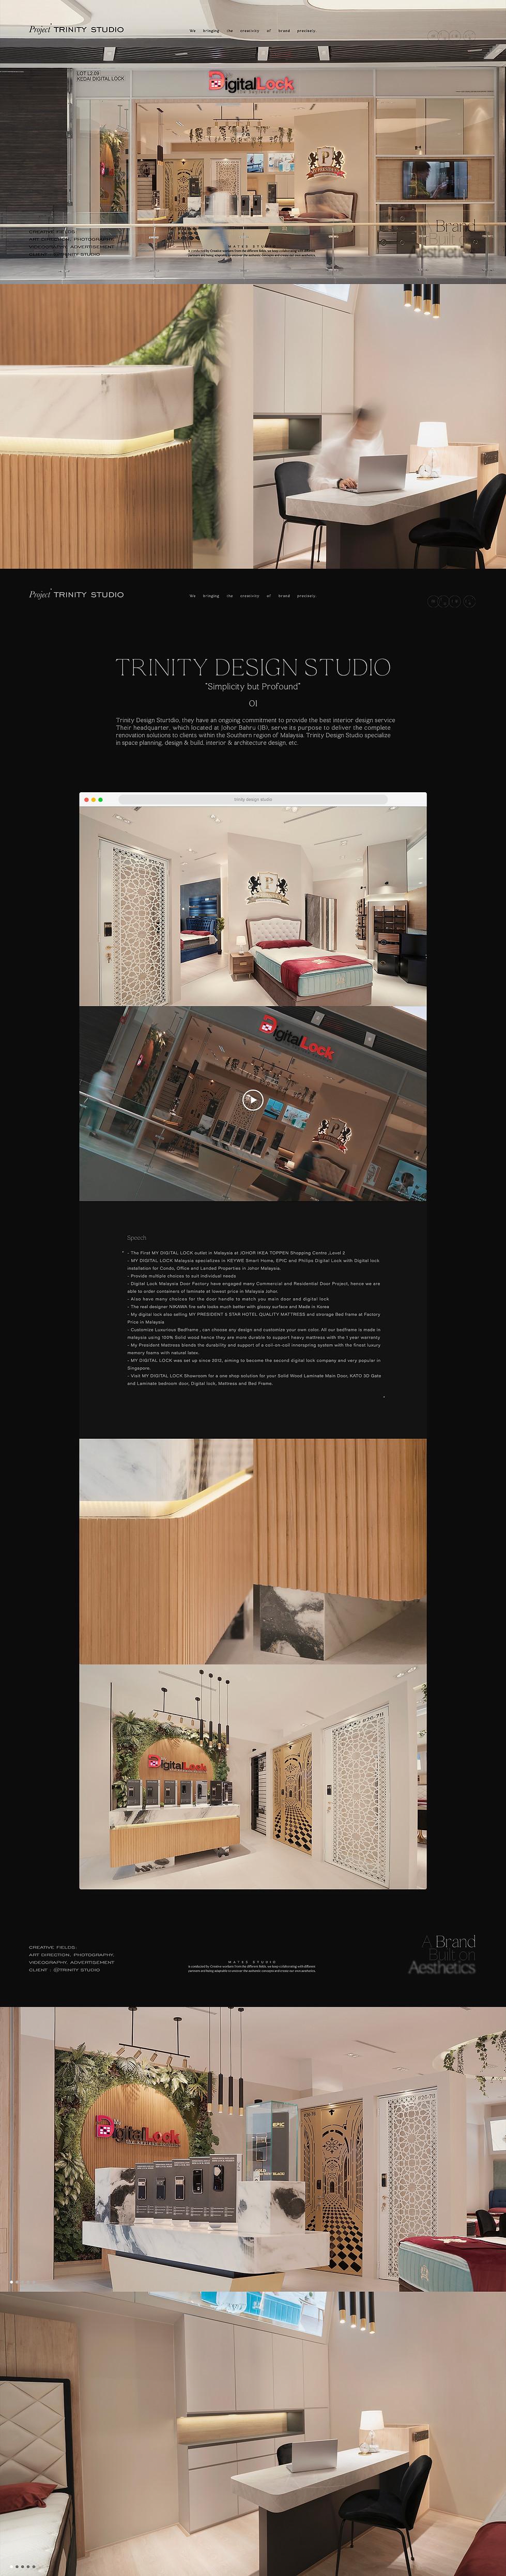 MS08 [TRINITY DESIGN STUDIO] SHOP.jpg